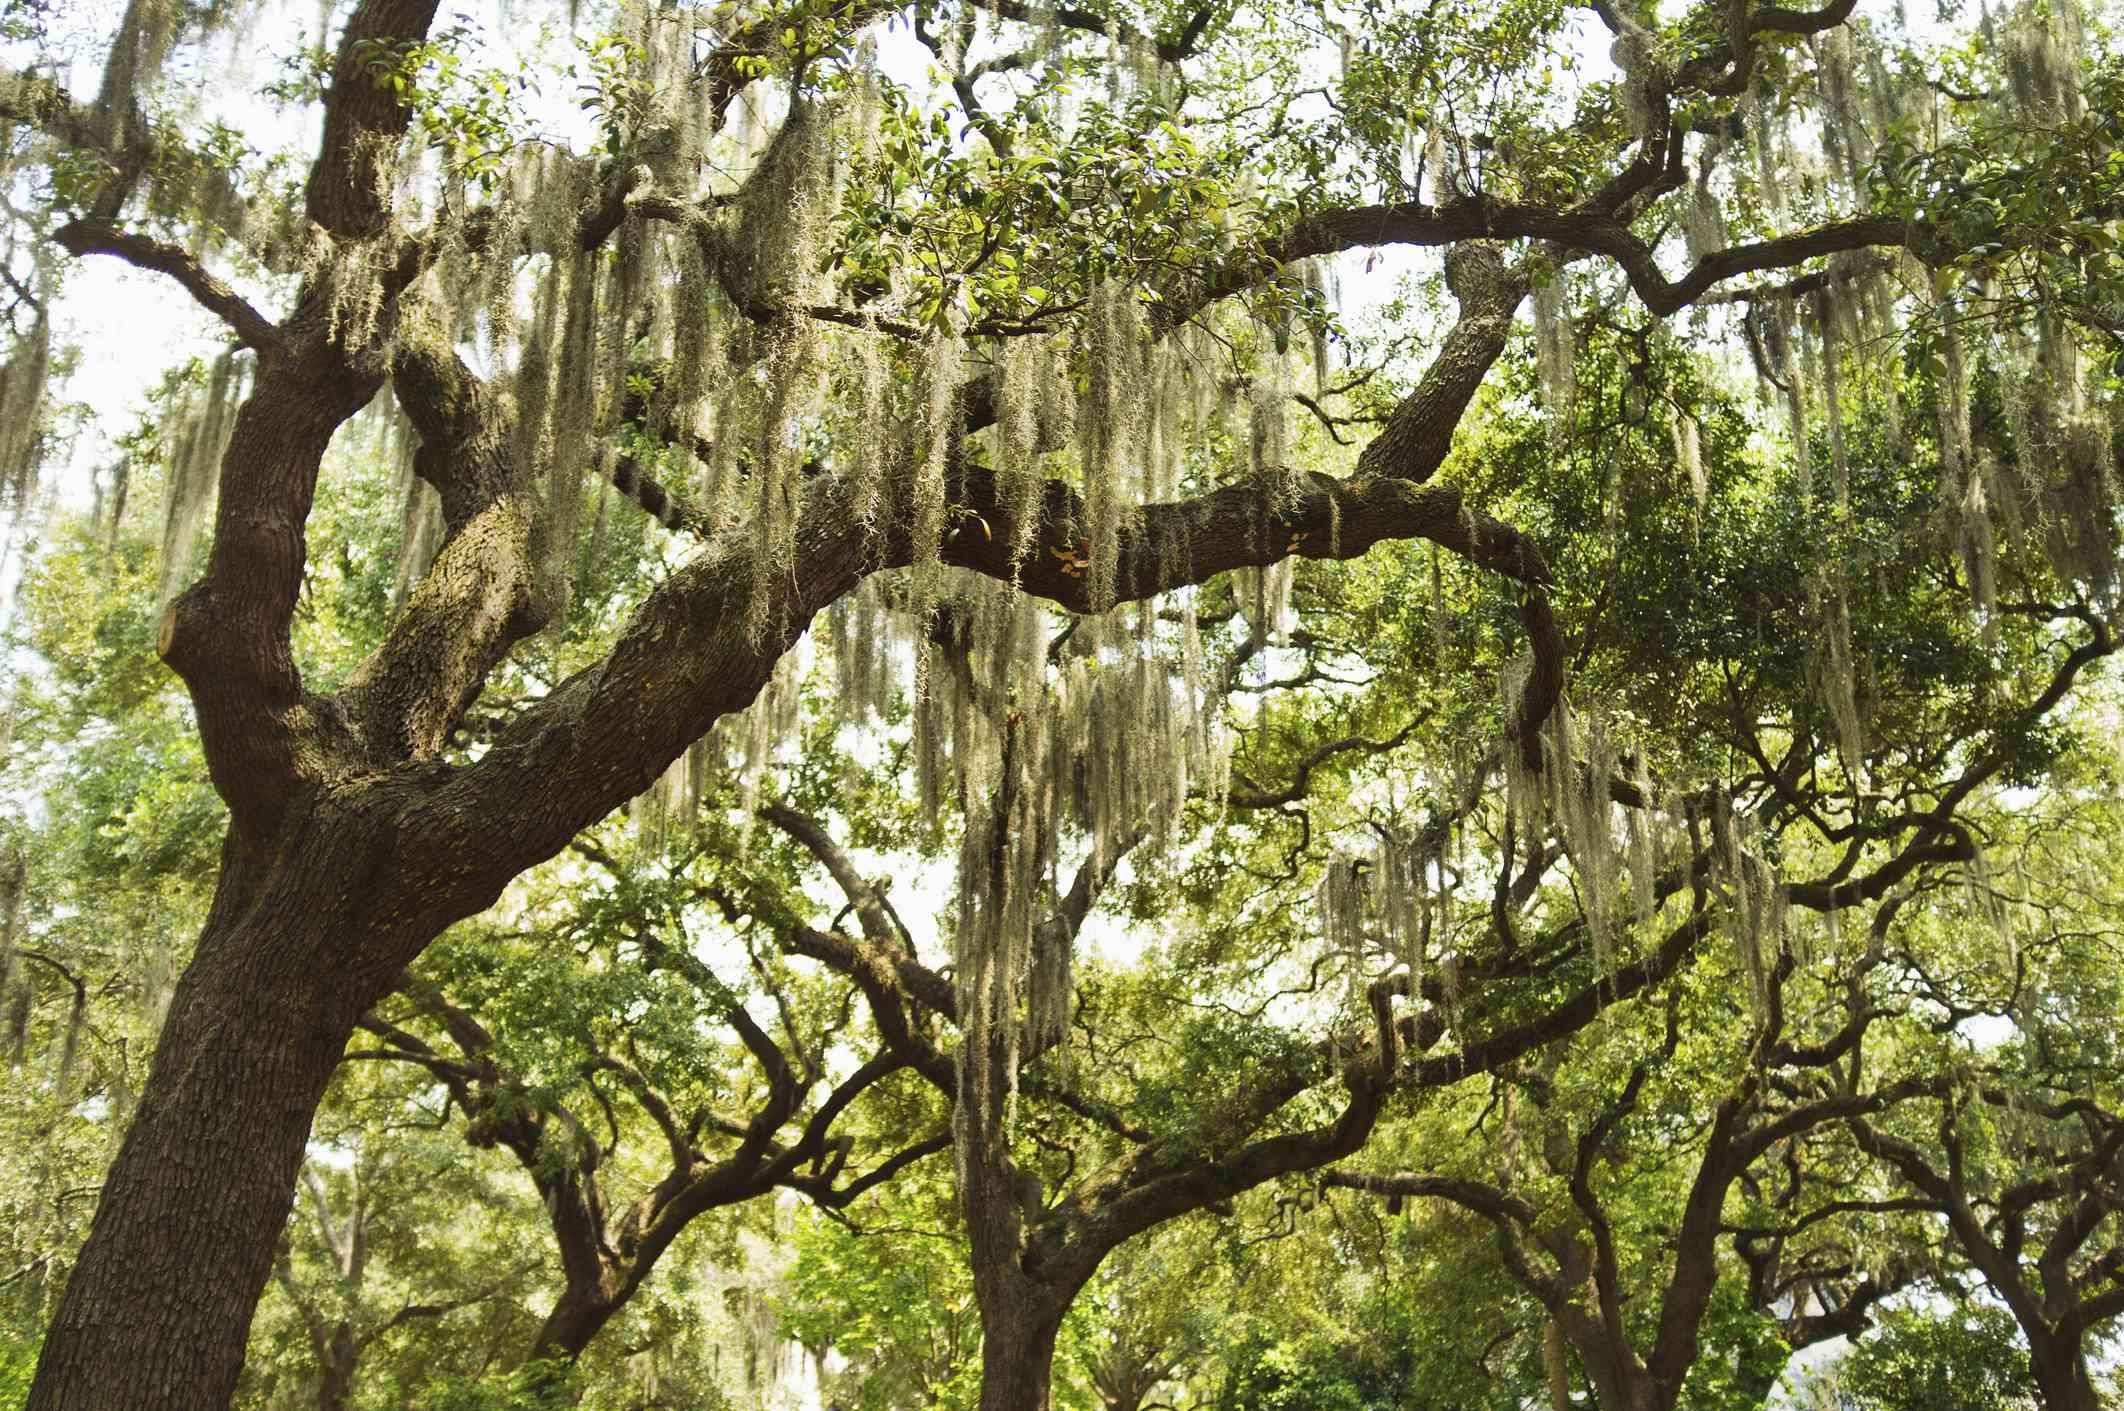 Shot looking up at a Live Oak tree.